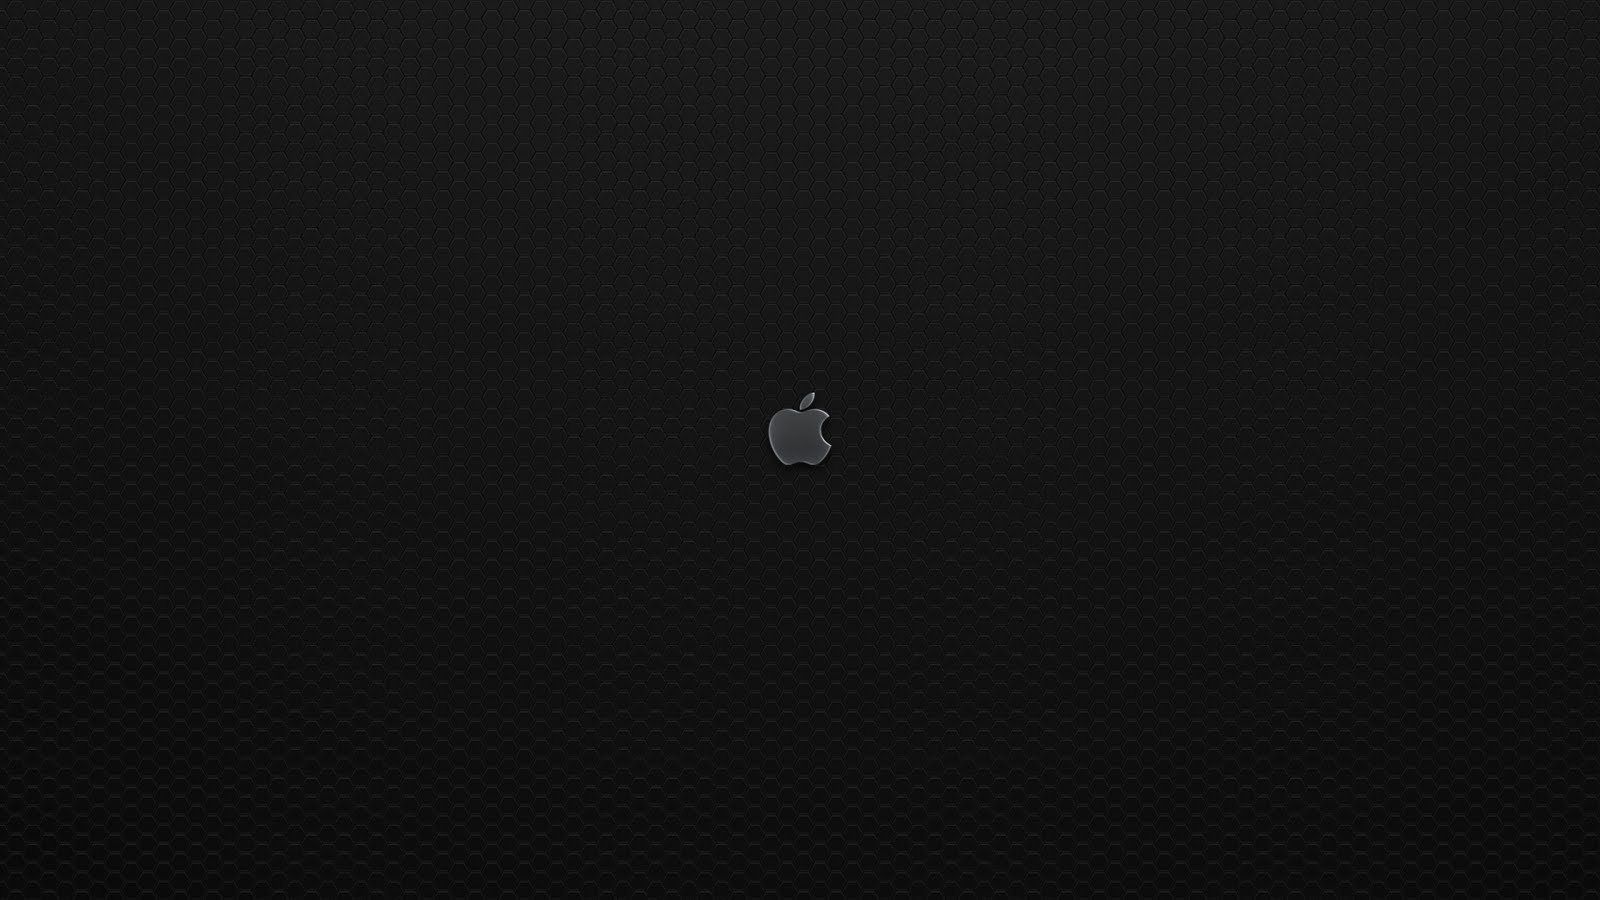 Background Pattern and Apple logo HD Wallpaper Hd Wallpaper 1600x900